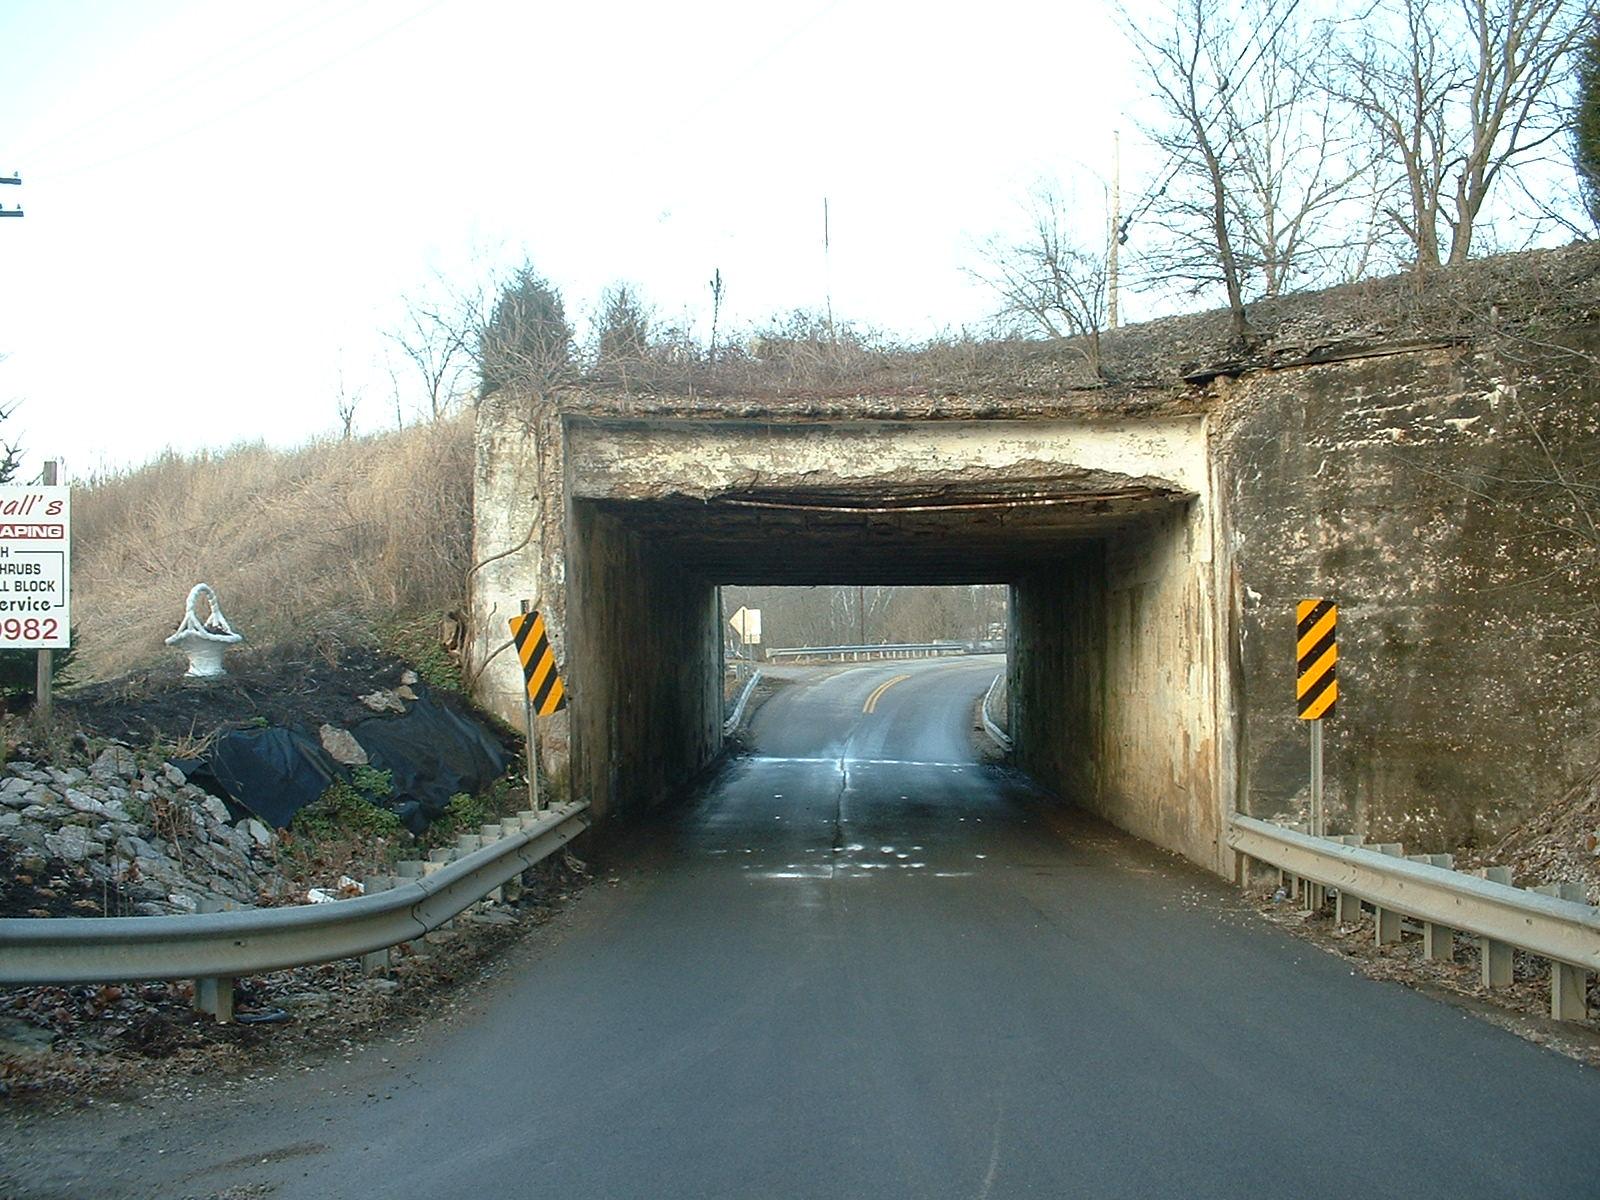 Click image for larger version  Name:Low Bridge 003.jpg Views:56 Size:383.8 KB ID:101129